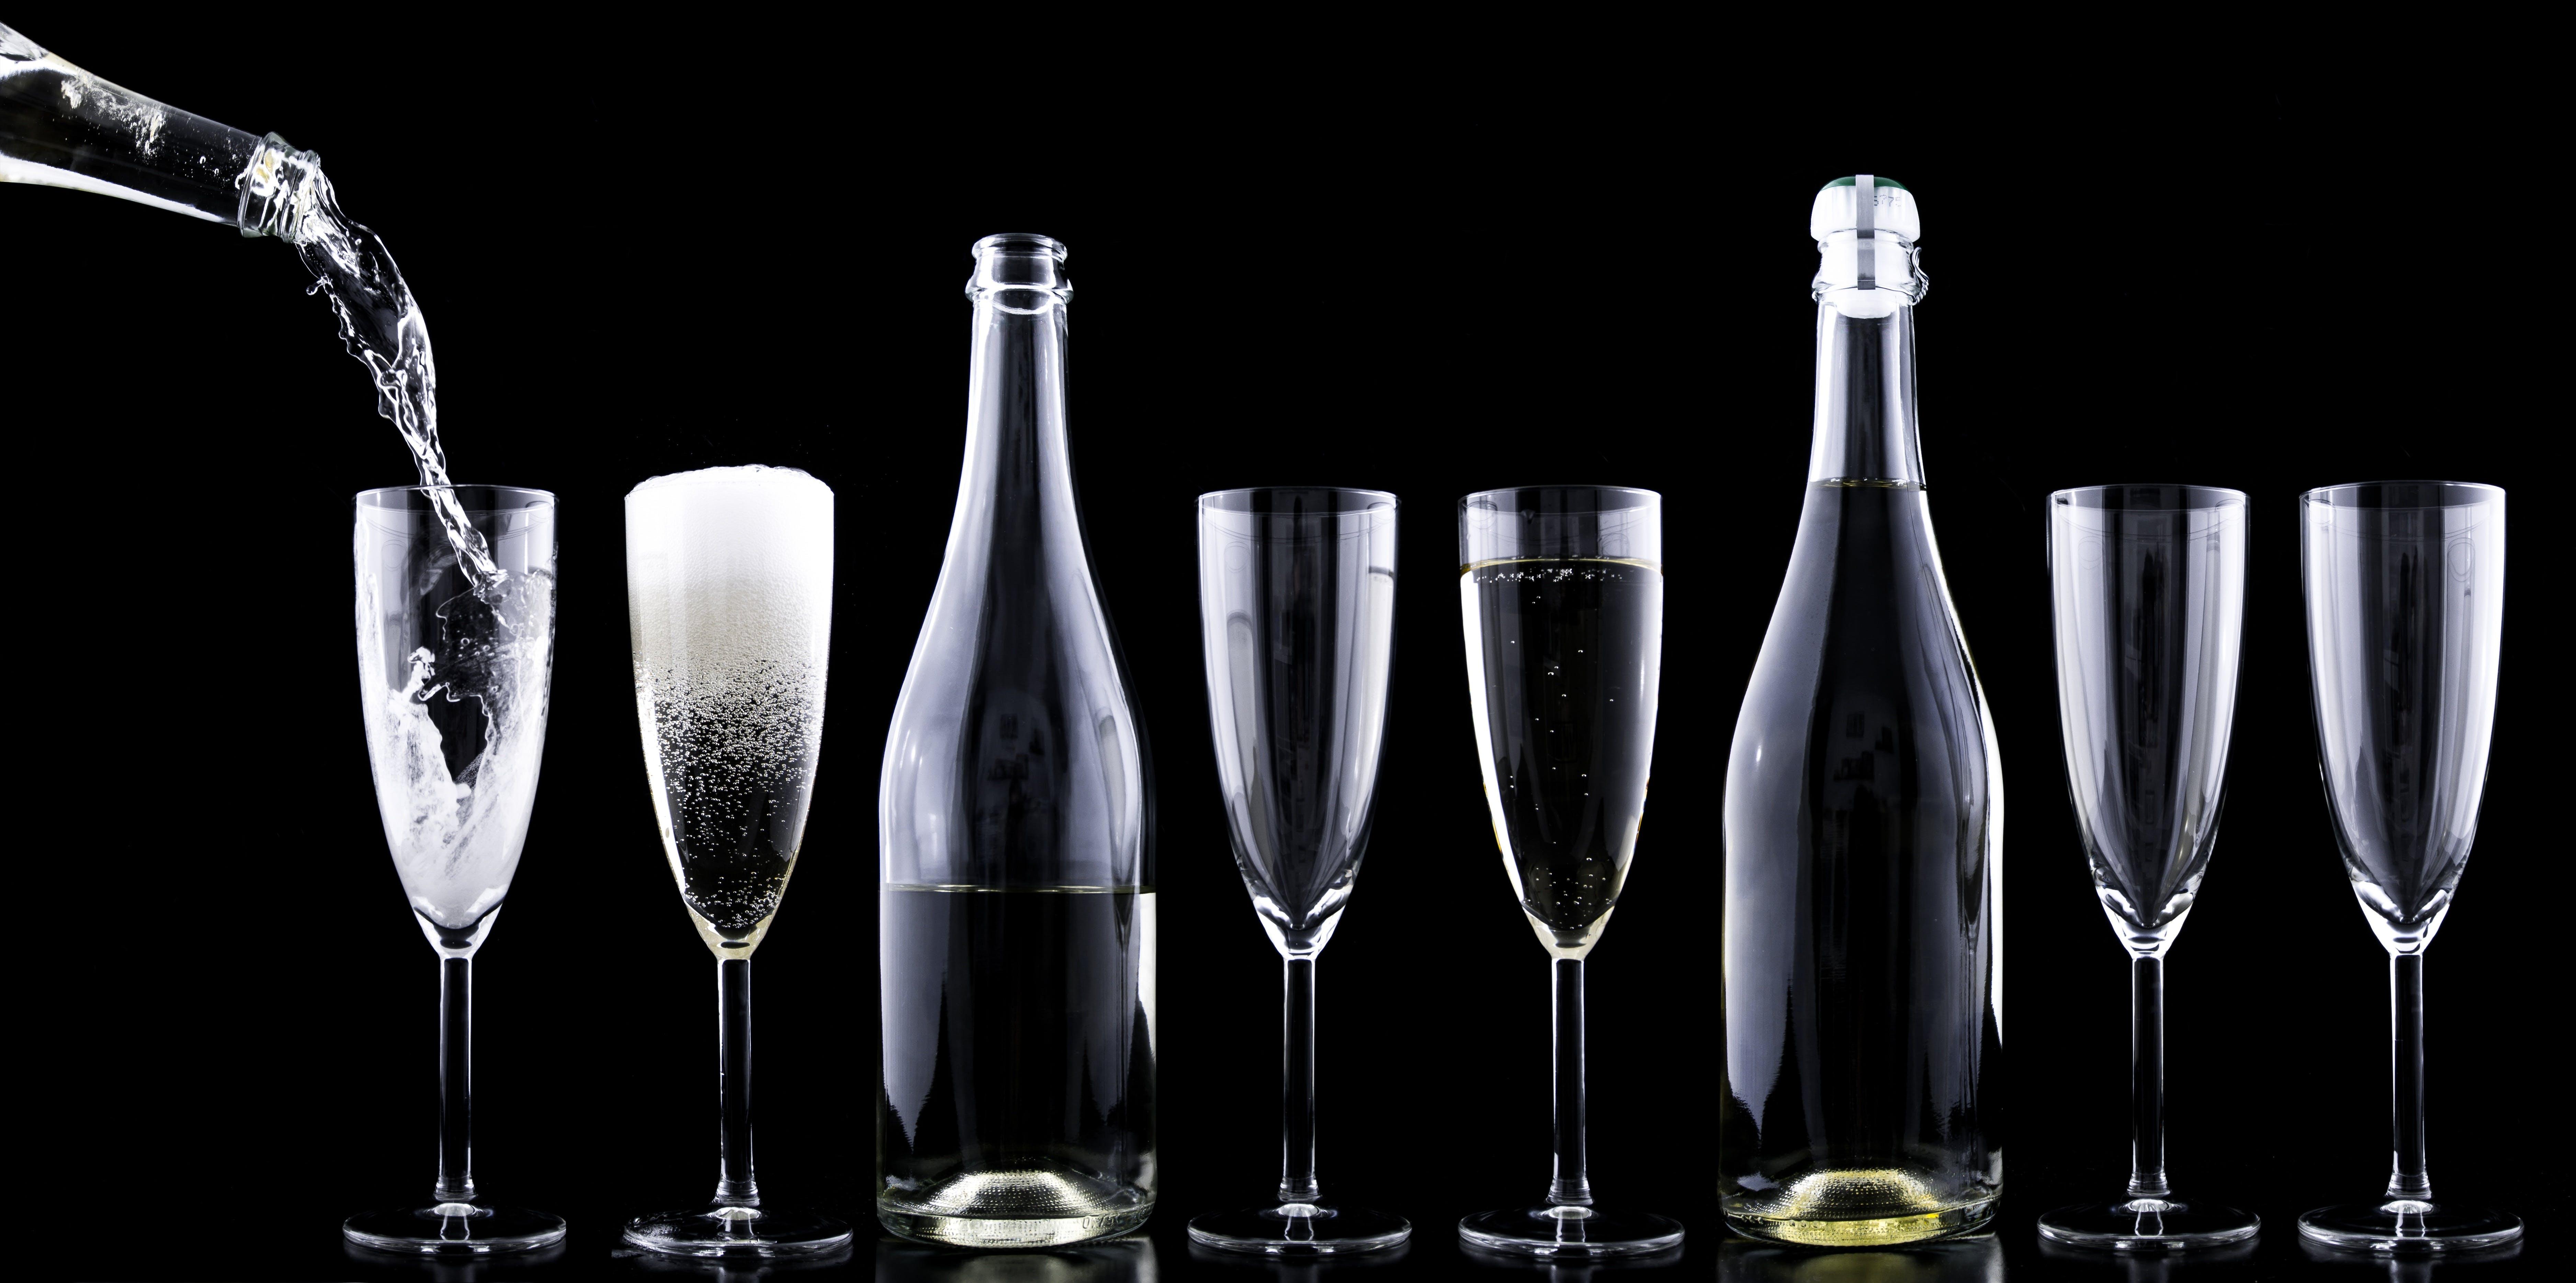 alkohol, bryzgać, butelki